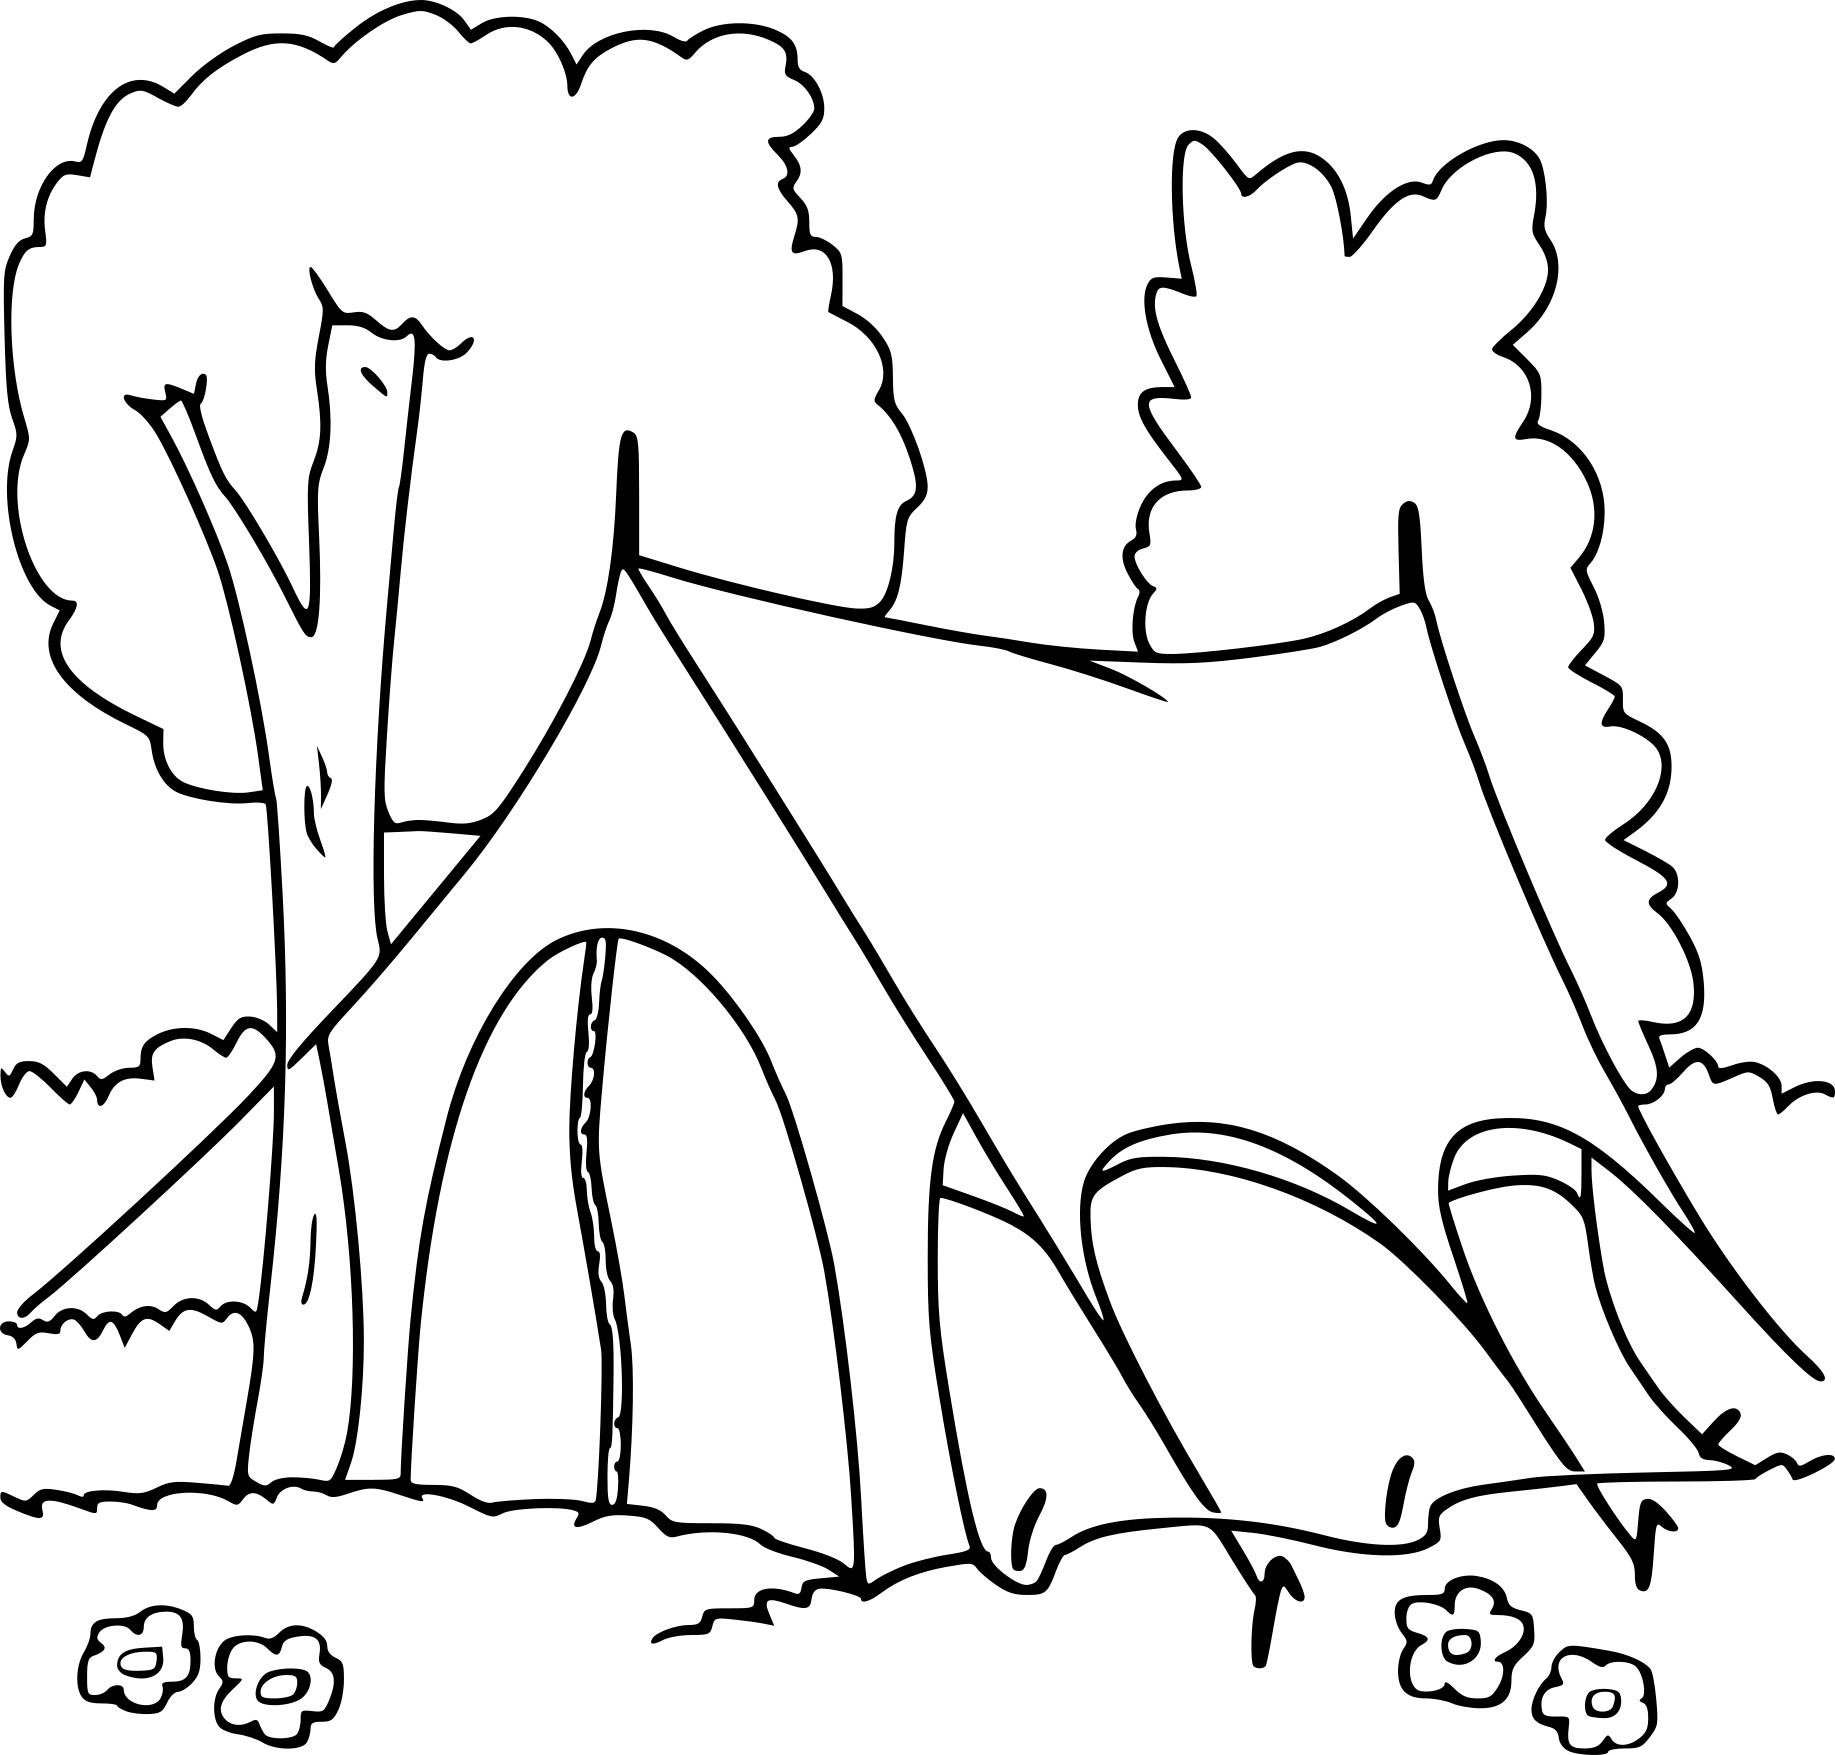 coloriage tente camping imprimer - Coloriage Toile